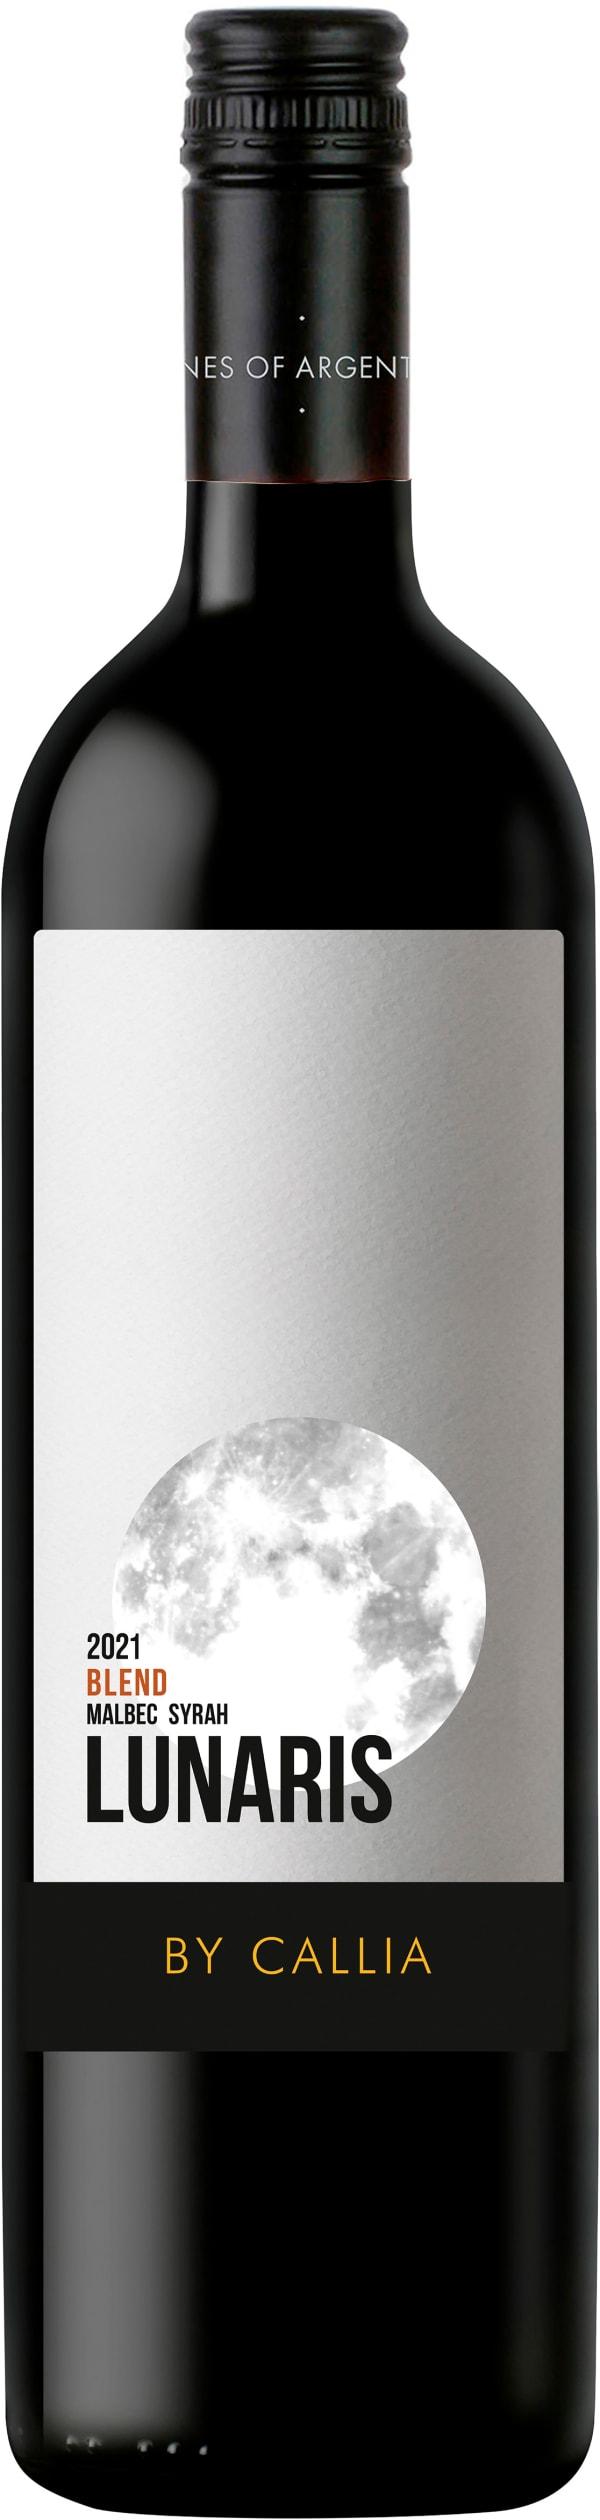 Lunaris Malbec Syrah 2020